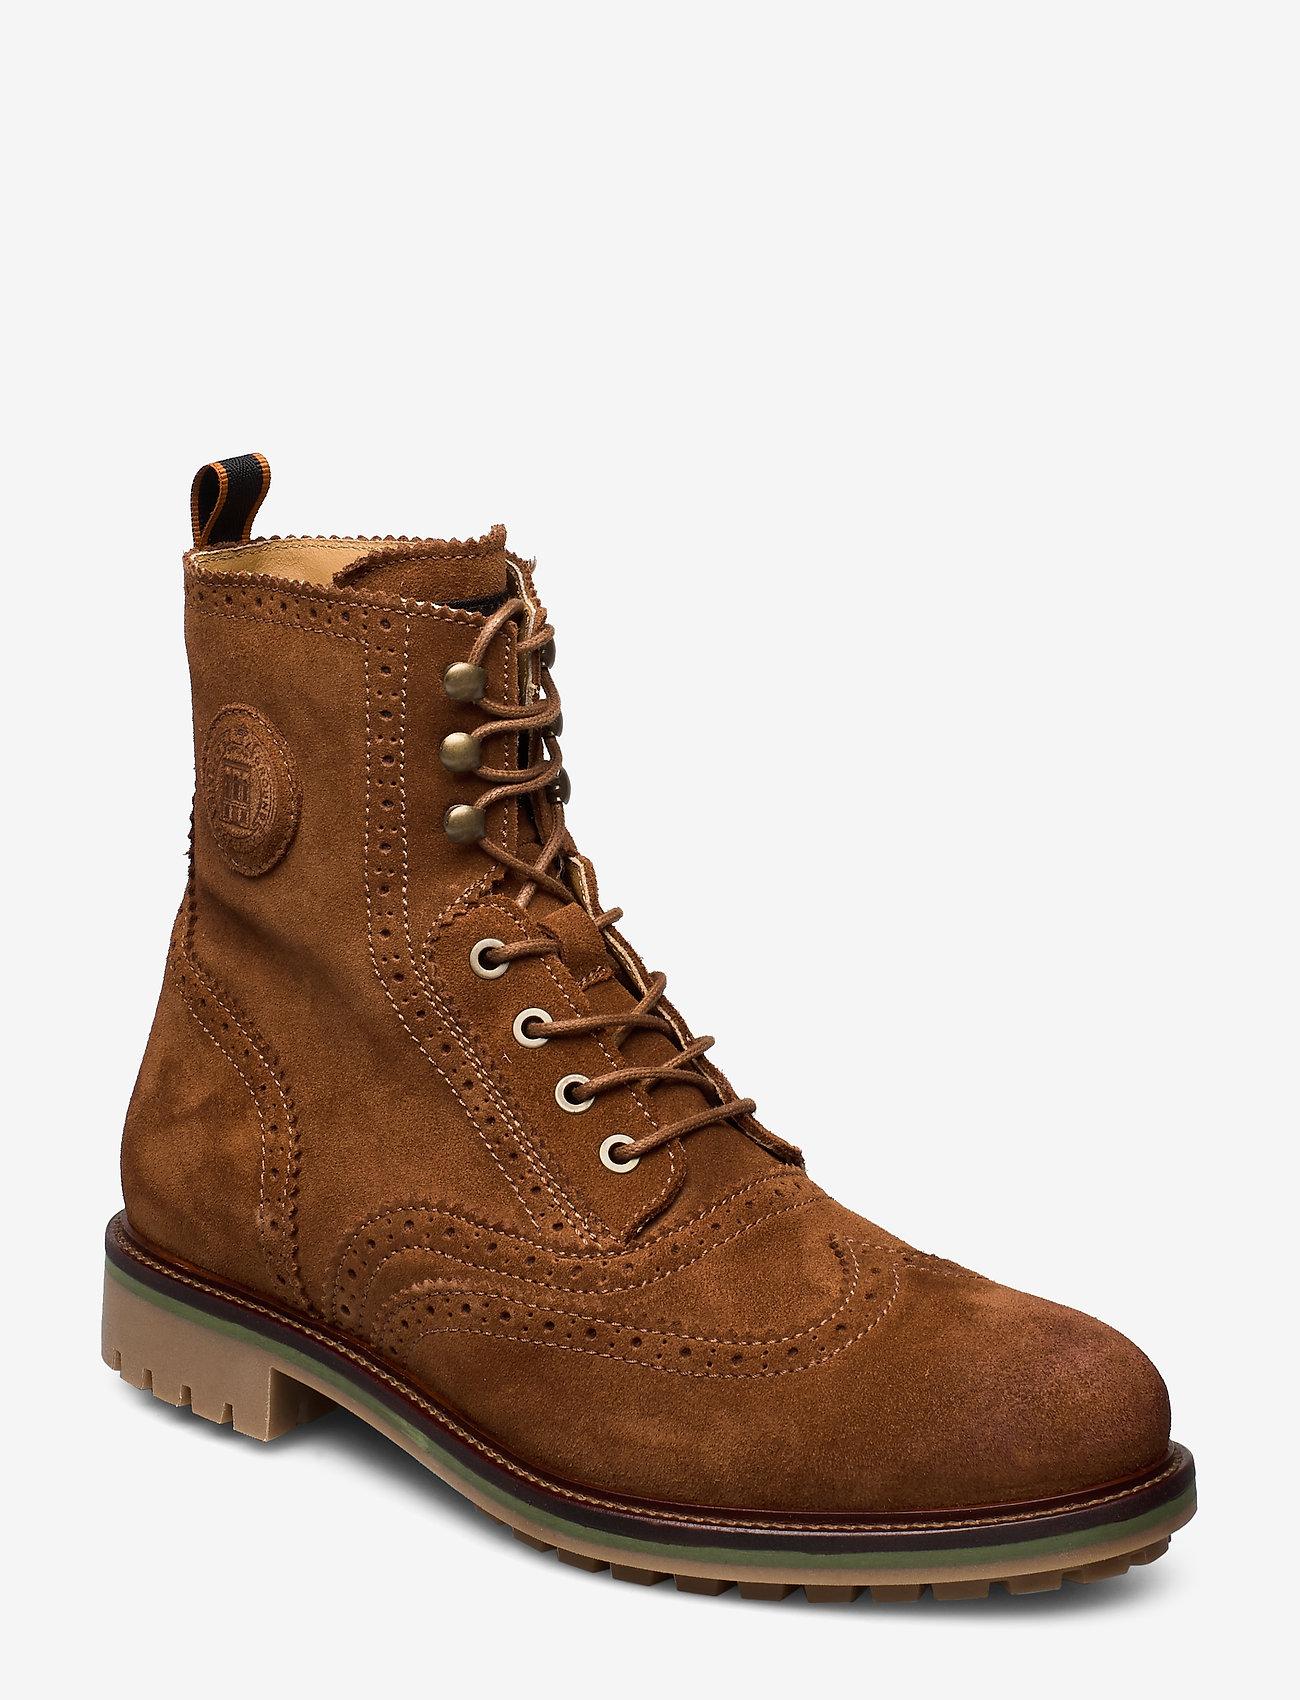 Scotch & Soda Shoes - Borrel Mid laceboot - laced boots - cognac - 0